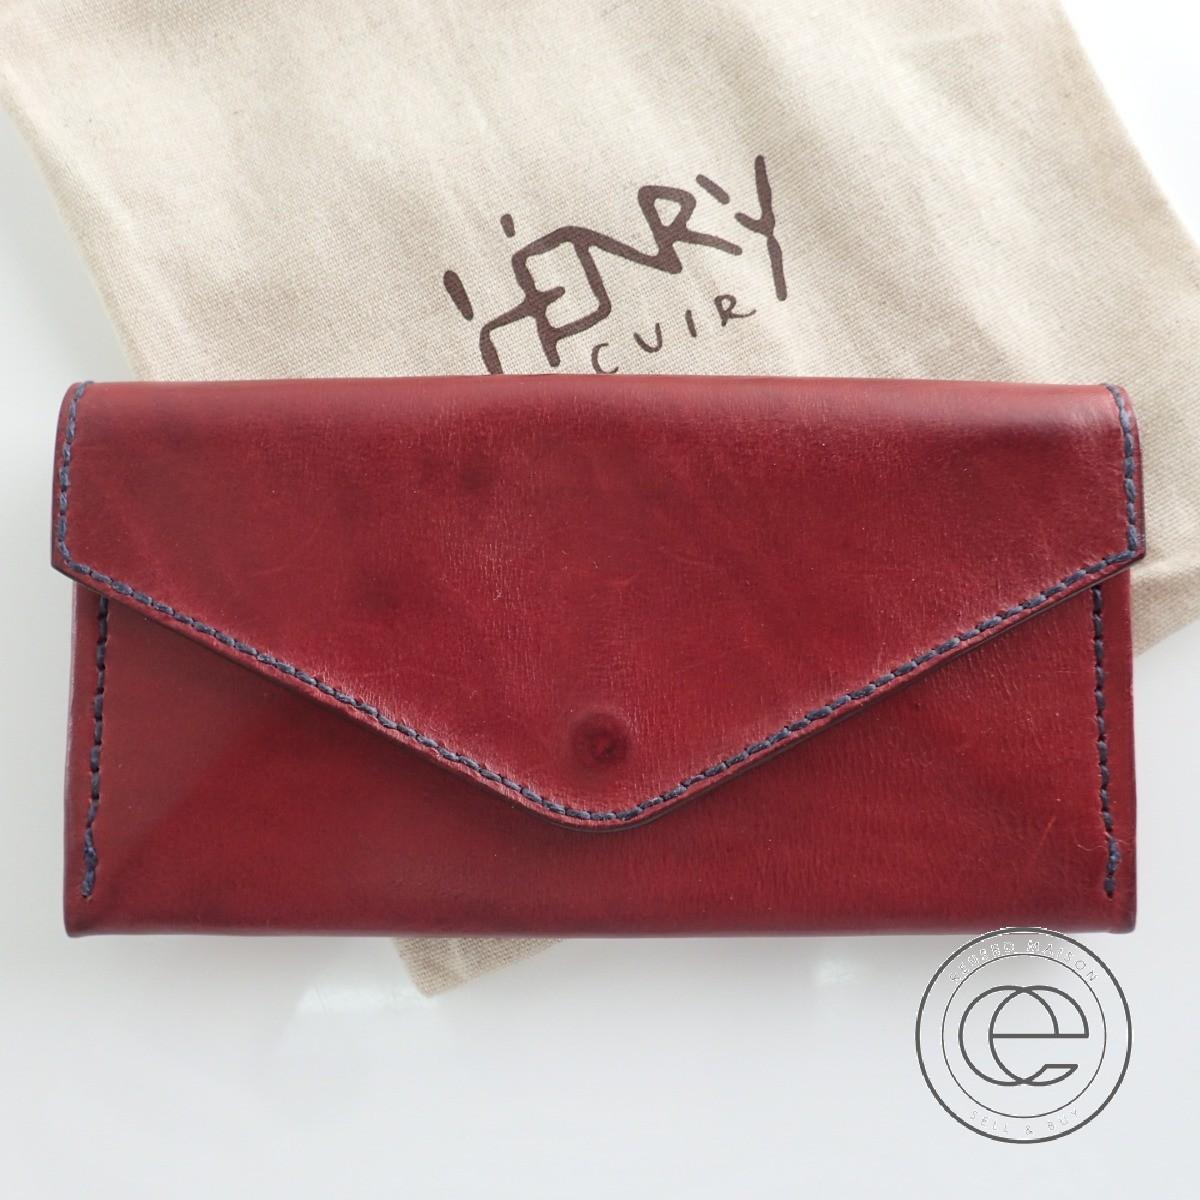 HENRY CUIRアンリークイール EUROPEENユーロピーン 犬刺繍 レザー 長財布(小銭入れあり)BORDEAUXボルドー レディース 【中古】